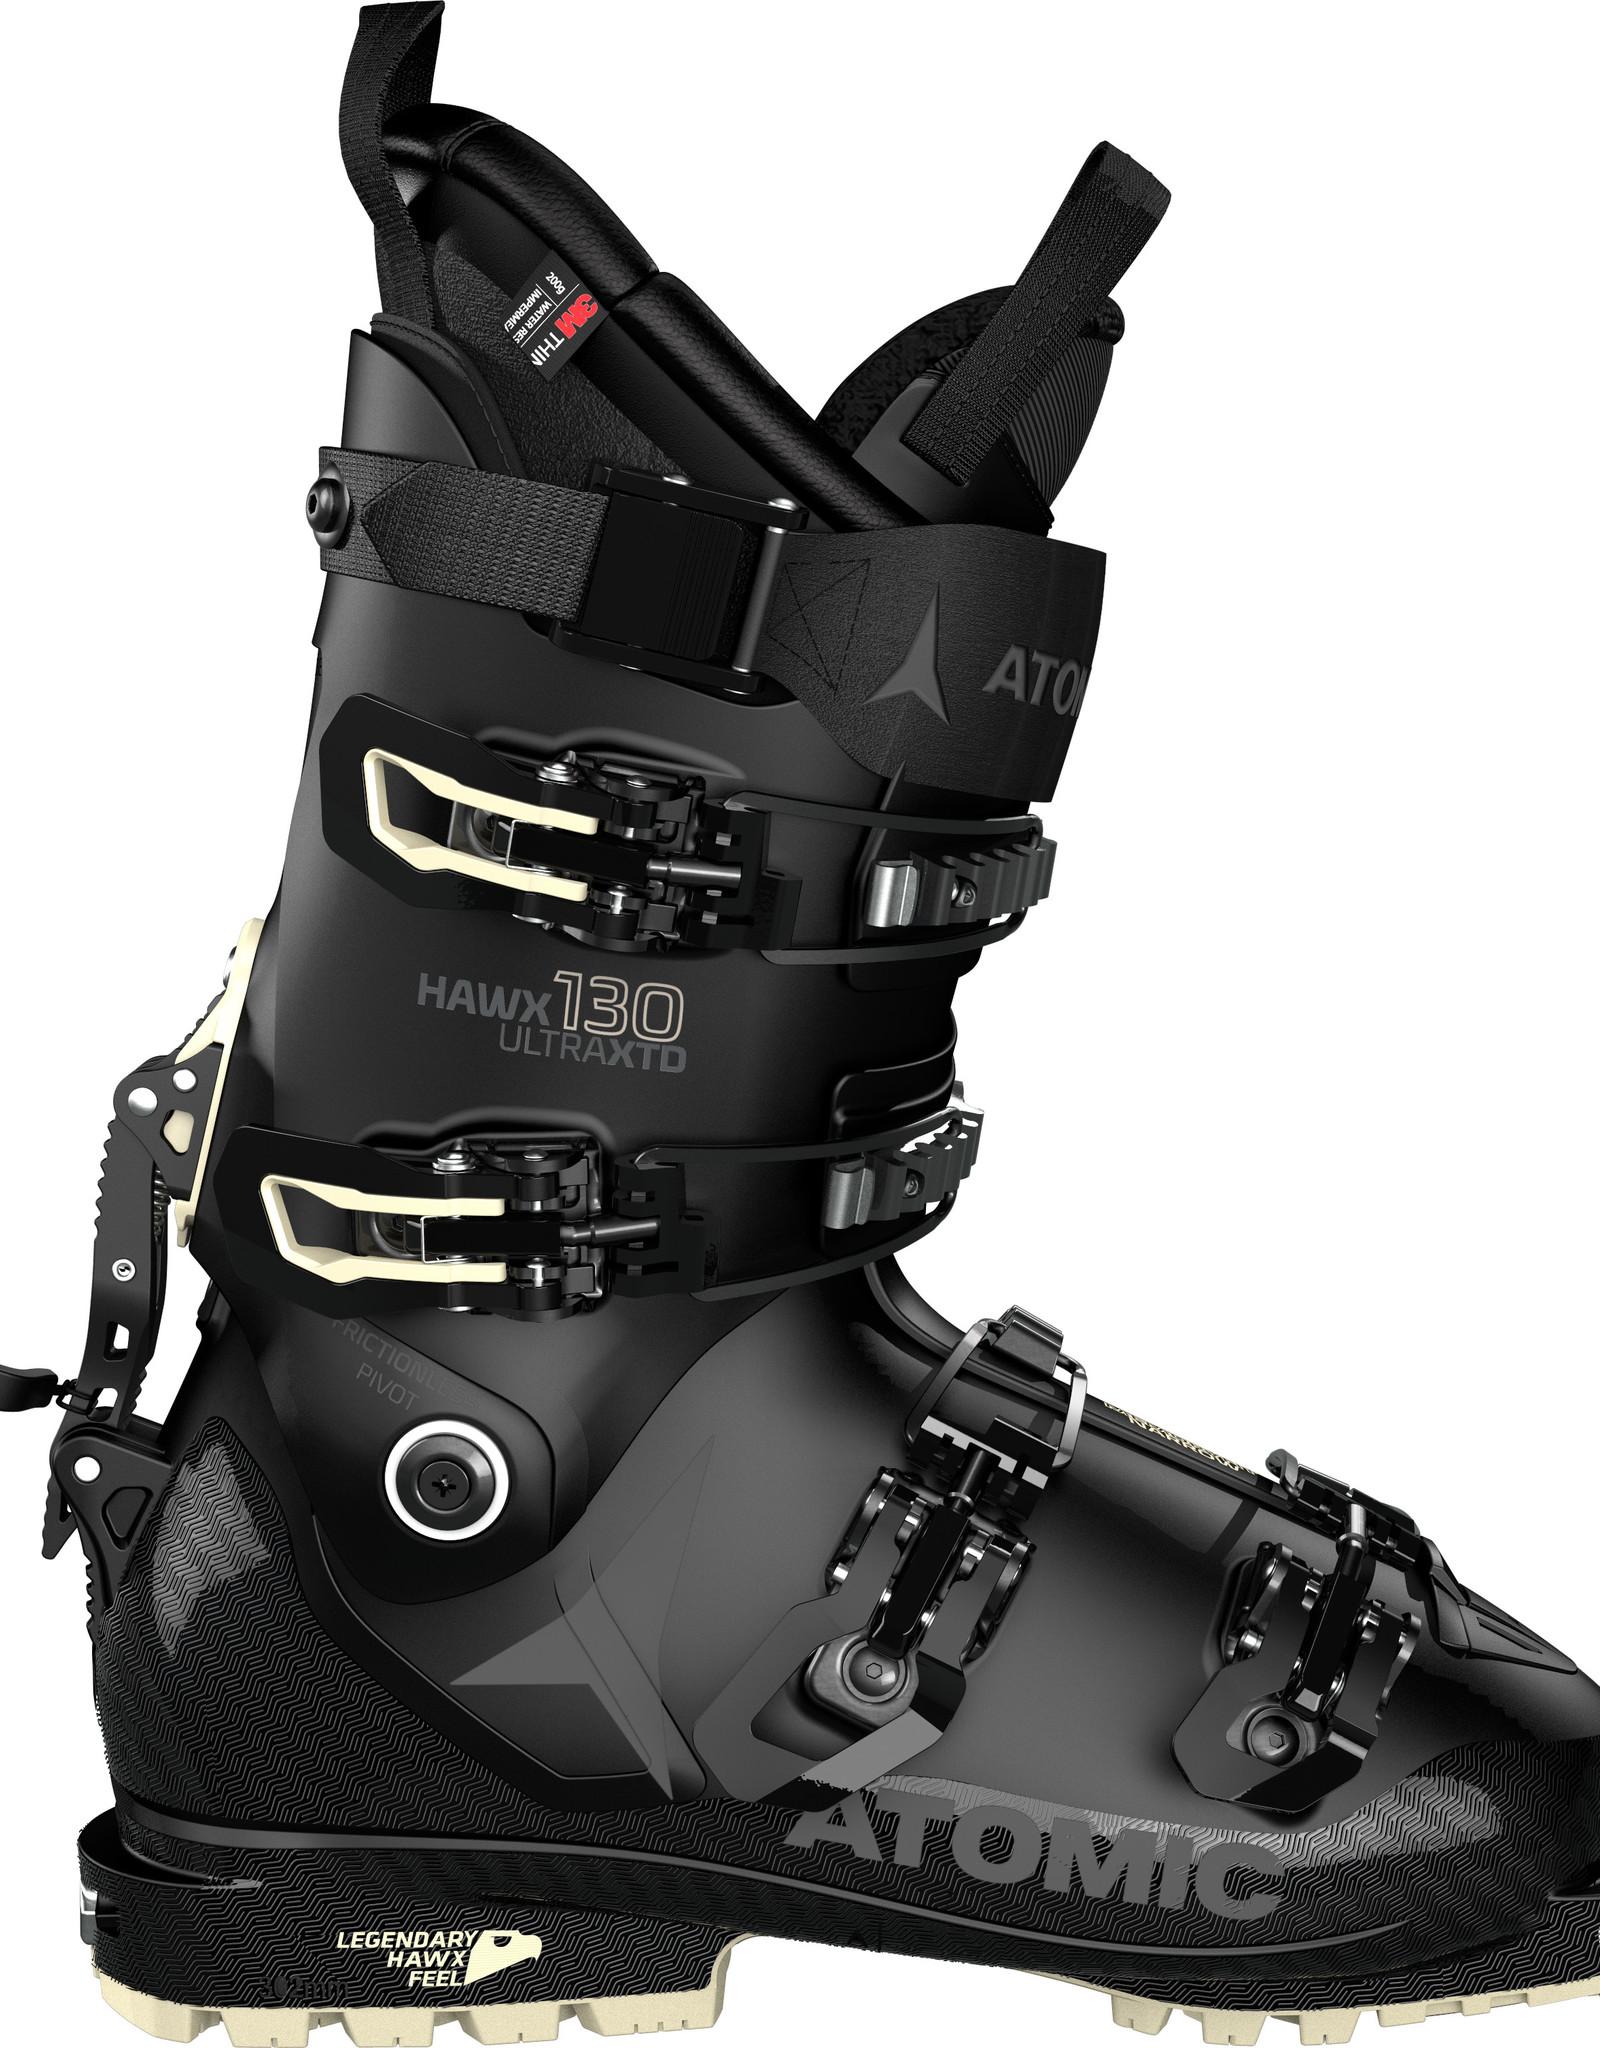 Atomic Hawx Ultra Xtd 130 Tech GW Black/sand -W2020